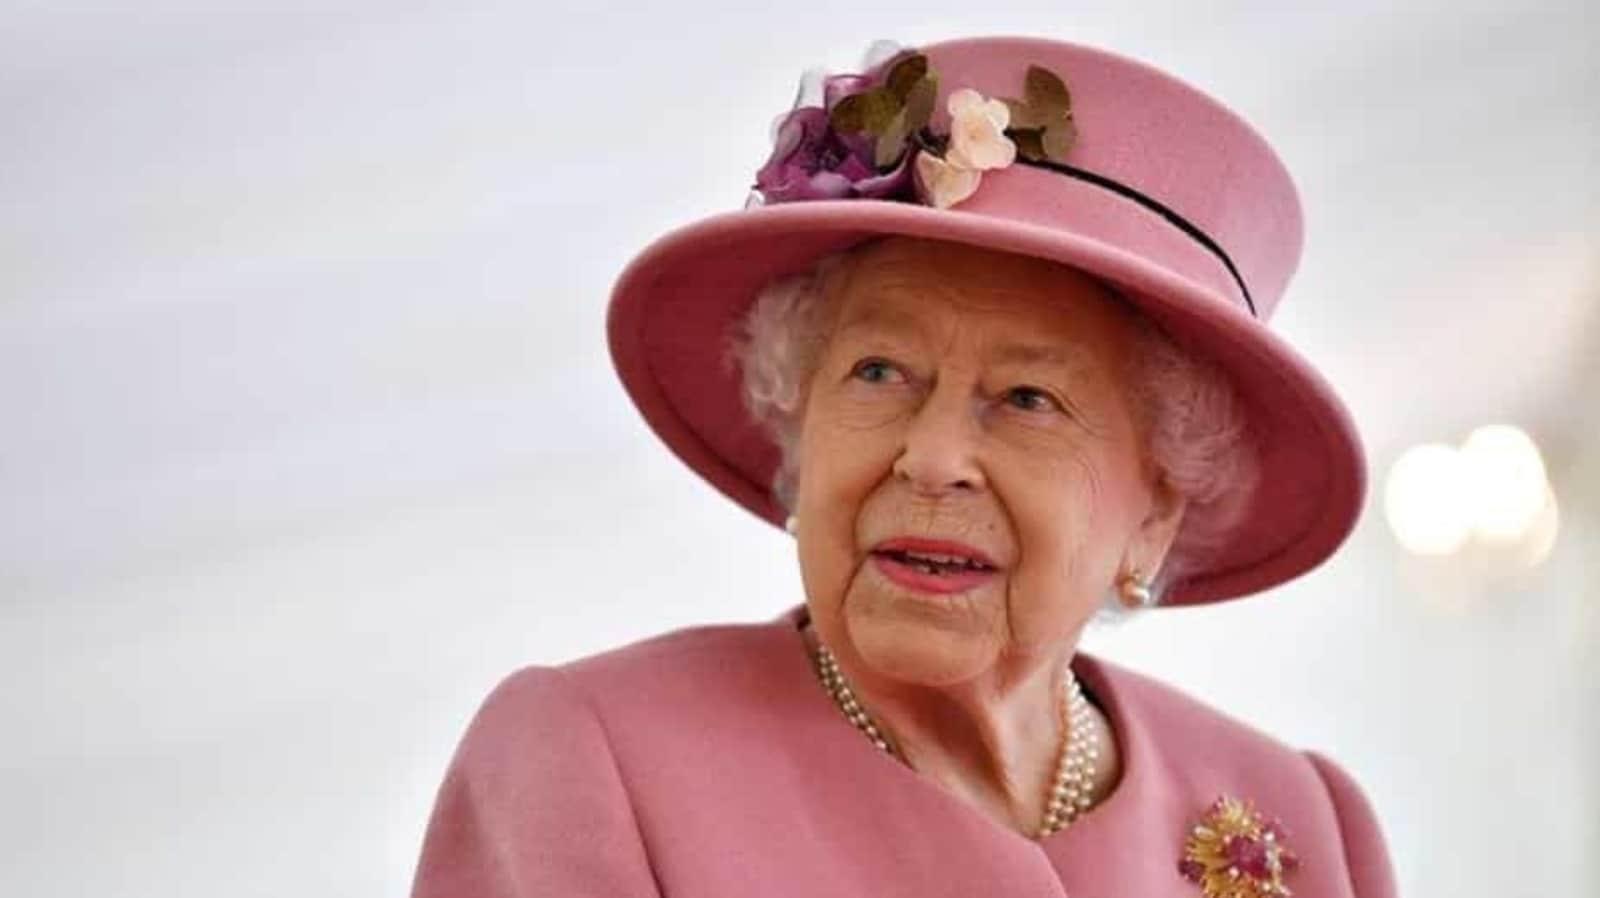 Queen Elizabeth responds to Harry and Meghan's racism accusations - Hindustan Times